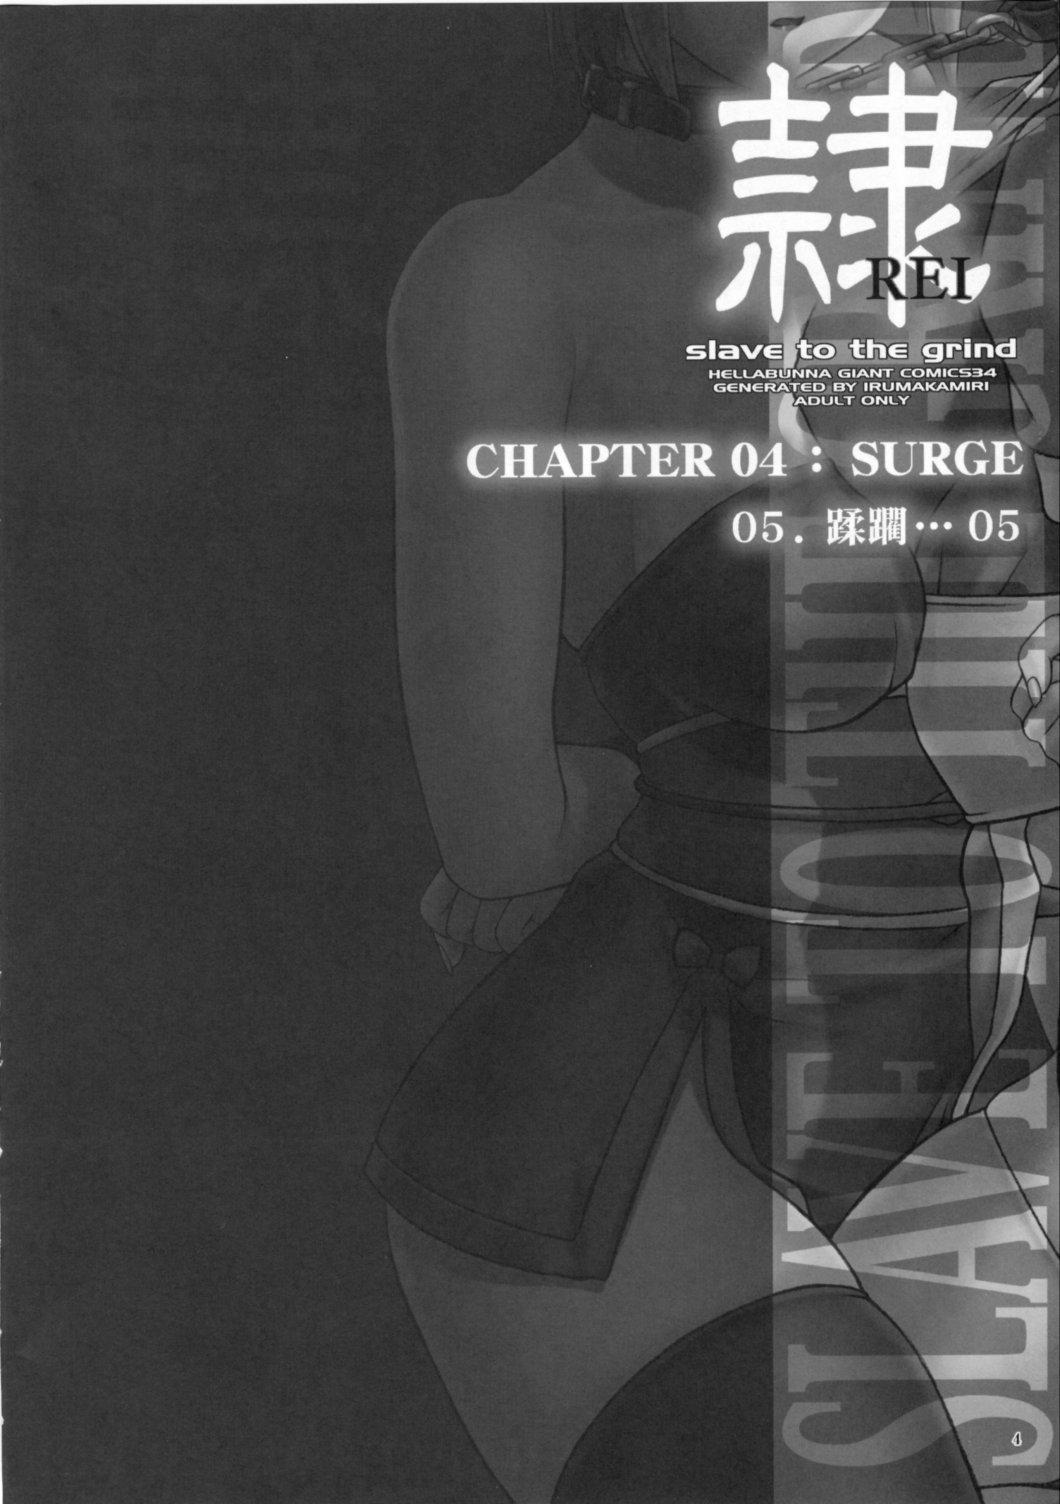 (C72) [Hellabunna (Iruma Kamiri)] REI - slave to the grind - CHAPTER 04: SURGE (Dead or Alive) 2